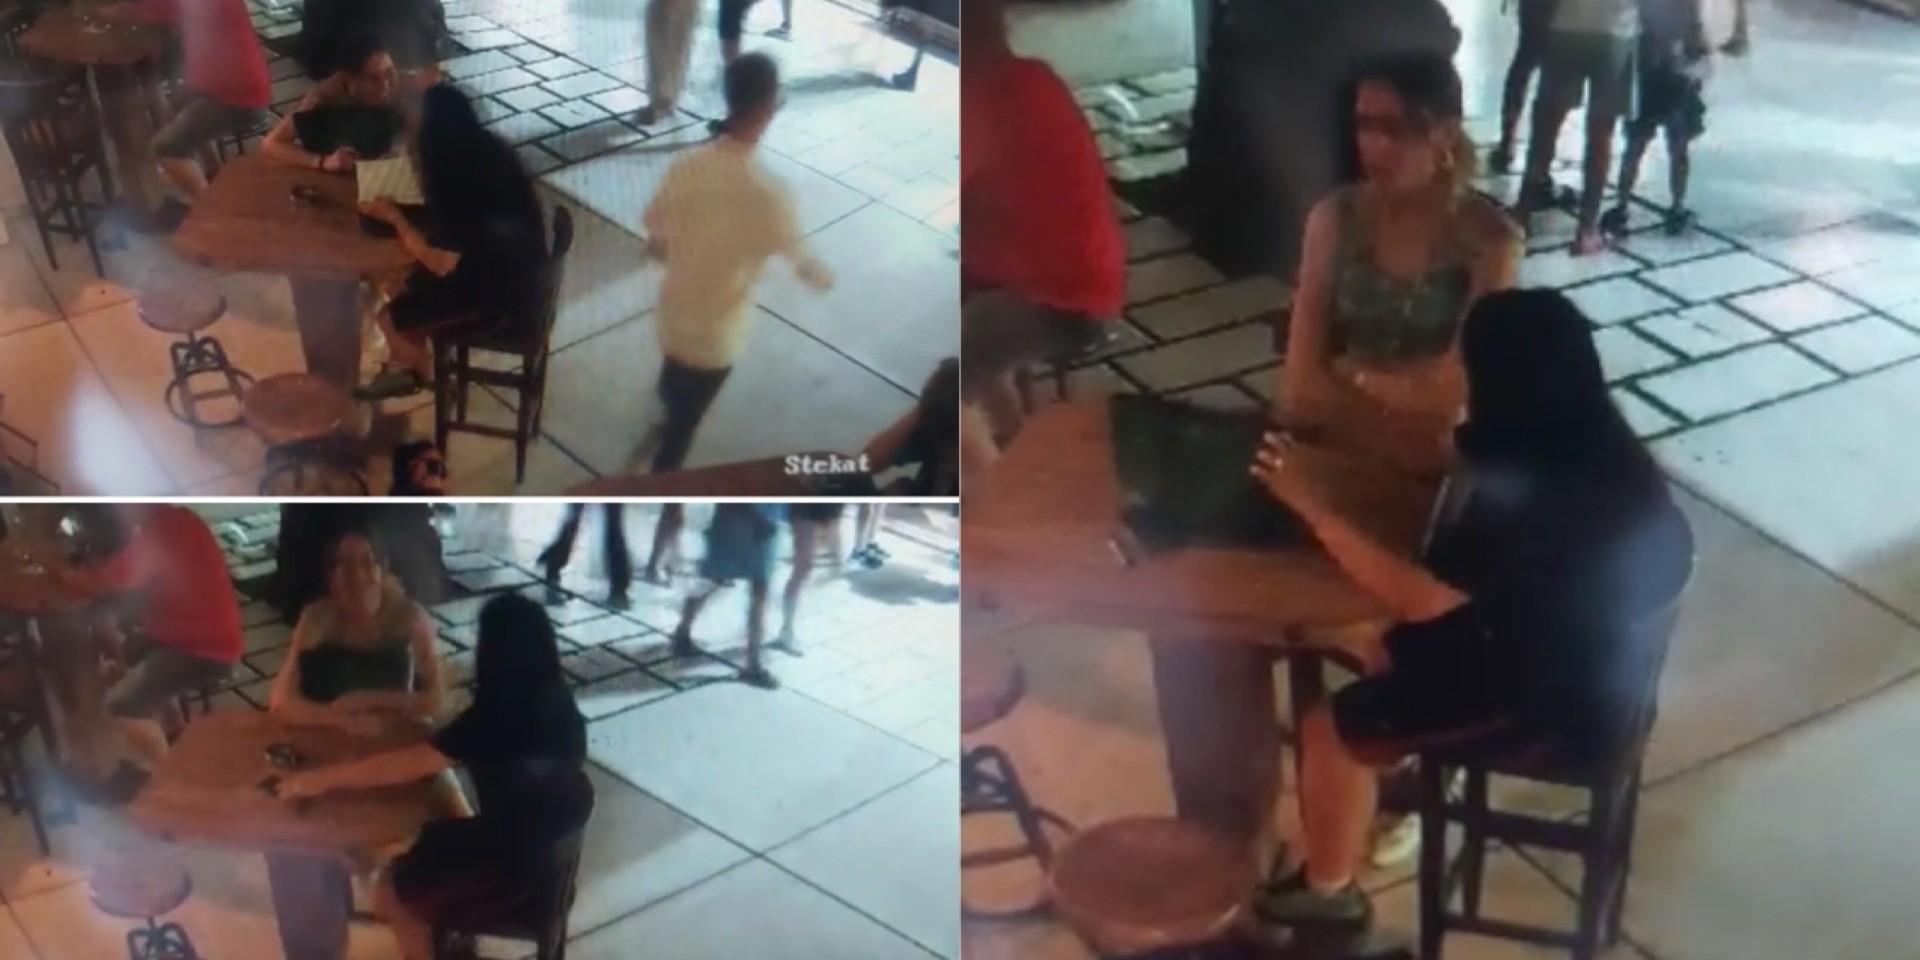 VIDEO BEZOBRAZLUKA Sjele za stol na Rivi, pokupile tuđi novac i nestale